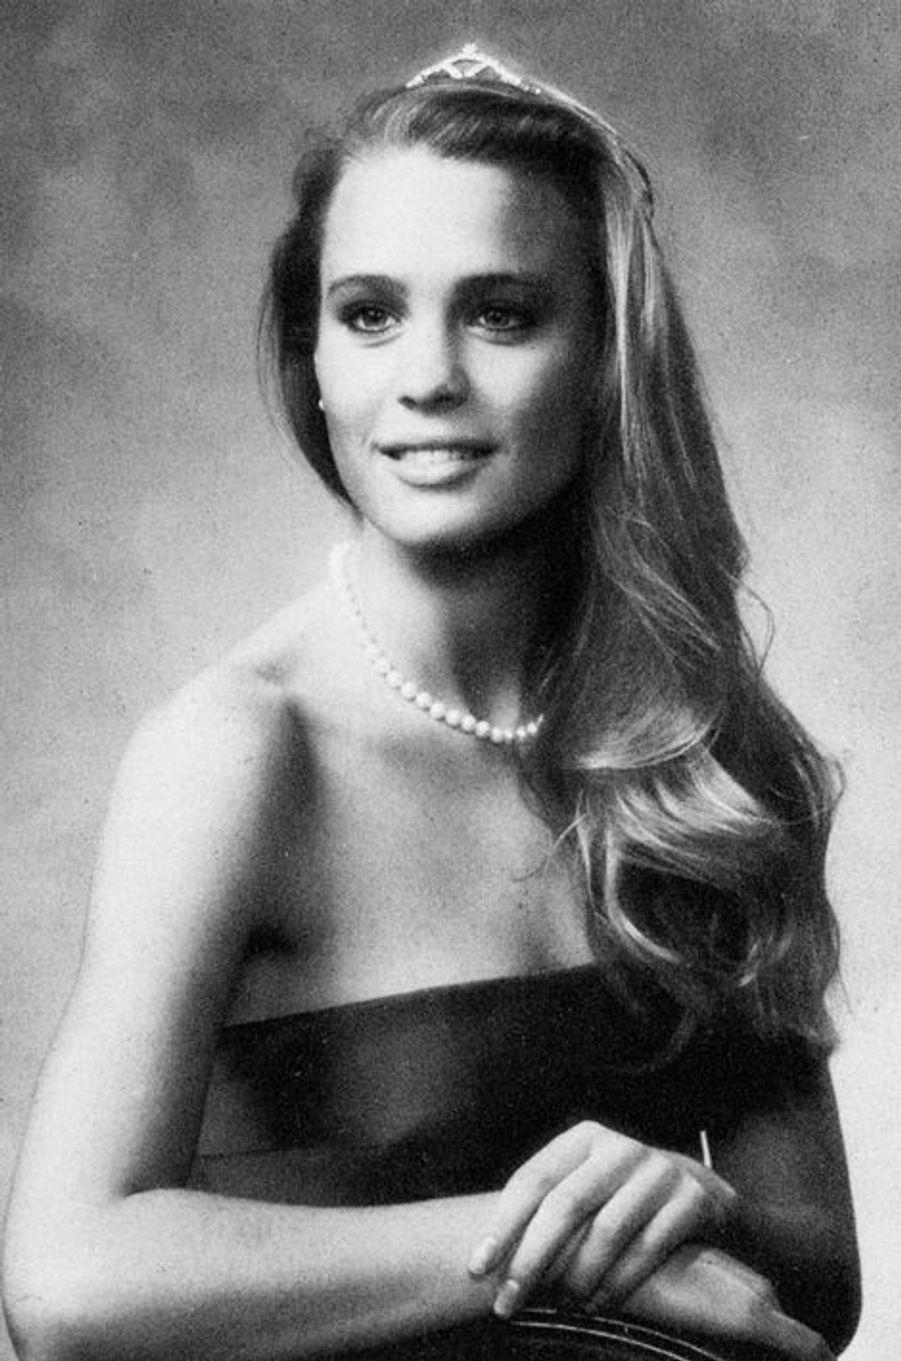 Robin Wright au collège de la Jolla, Californie en 1981